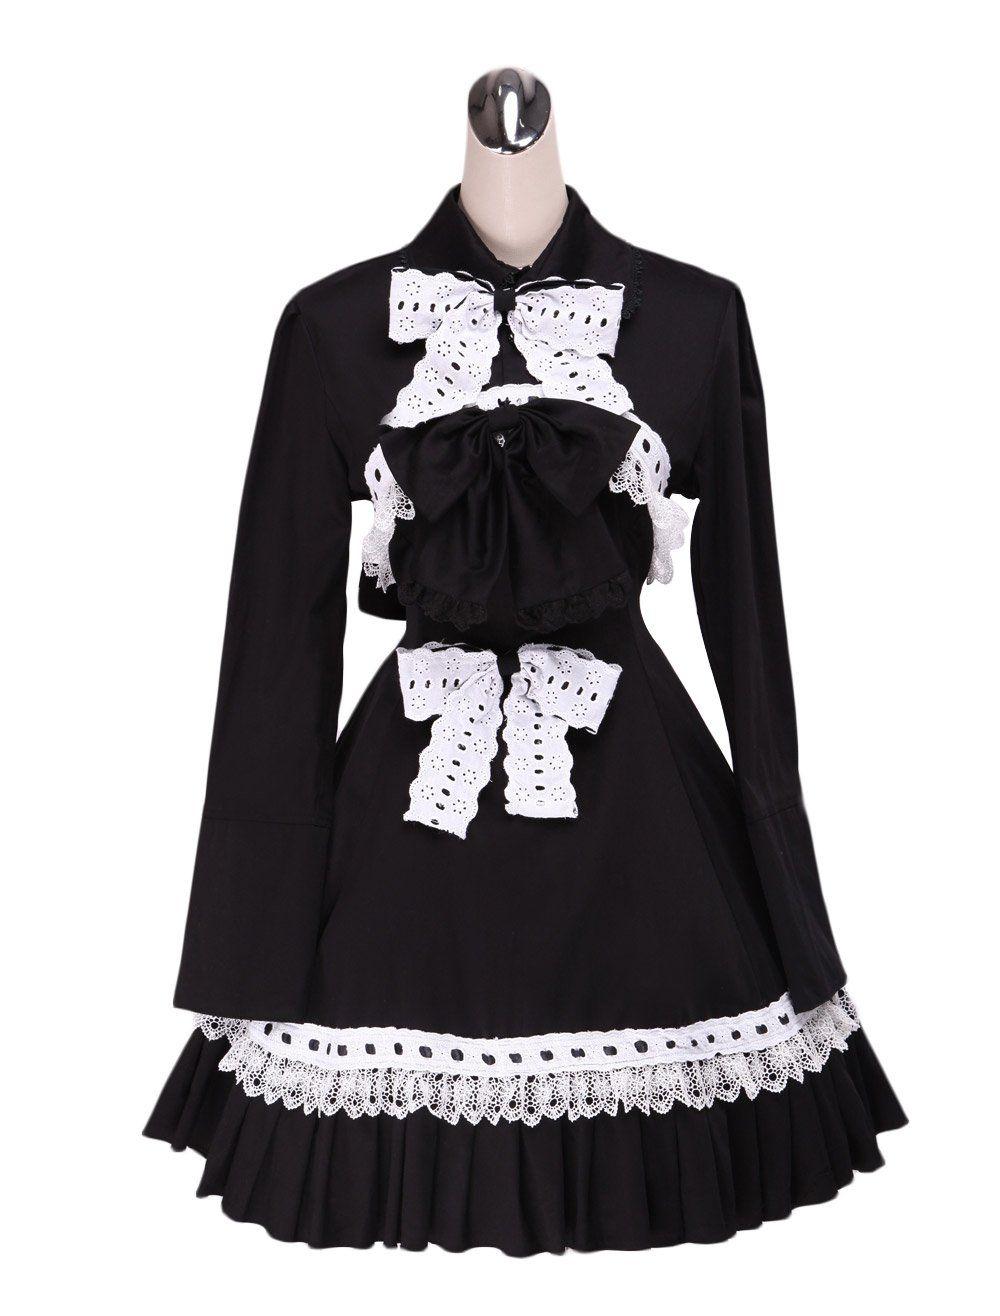 078ed3ded1b480 AvaLolita Black Cotton Lolita Dress with White Bows